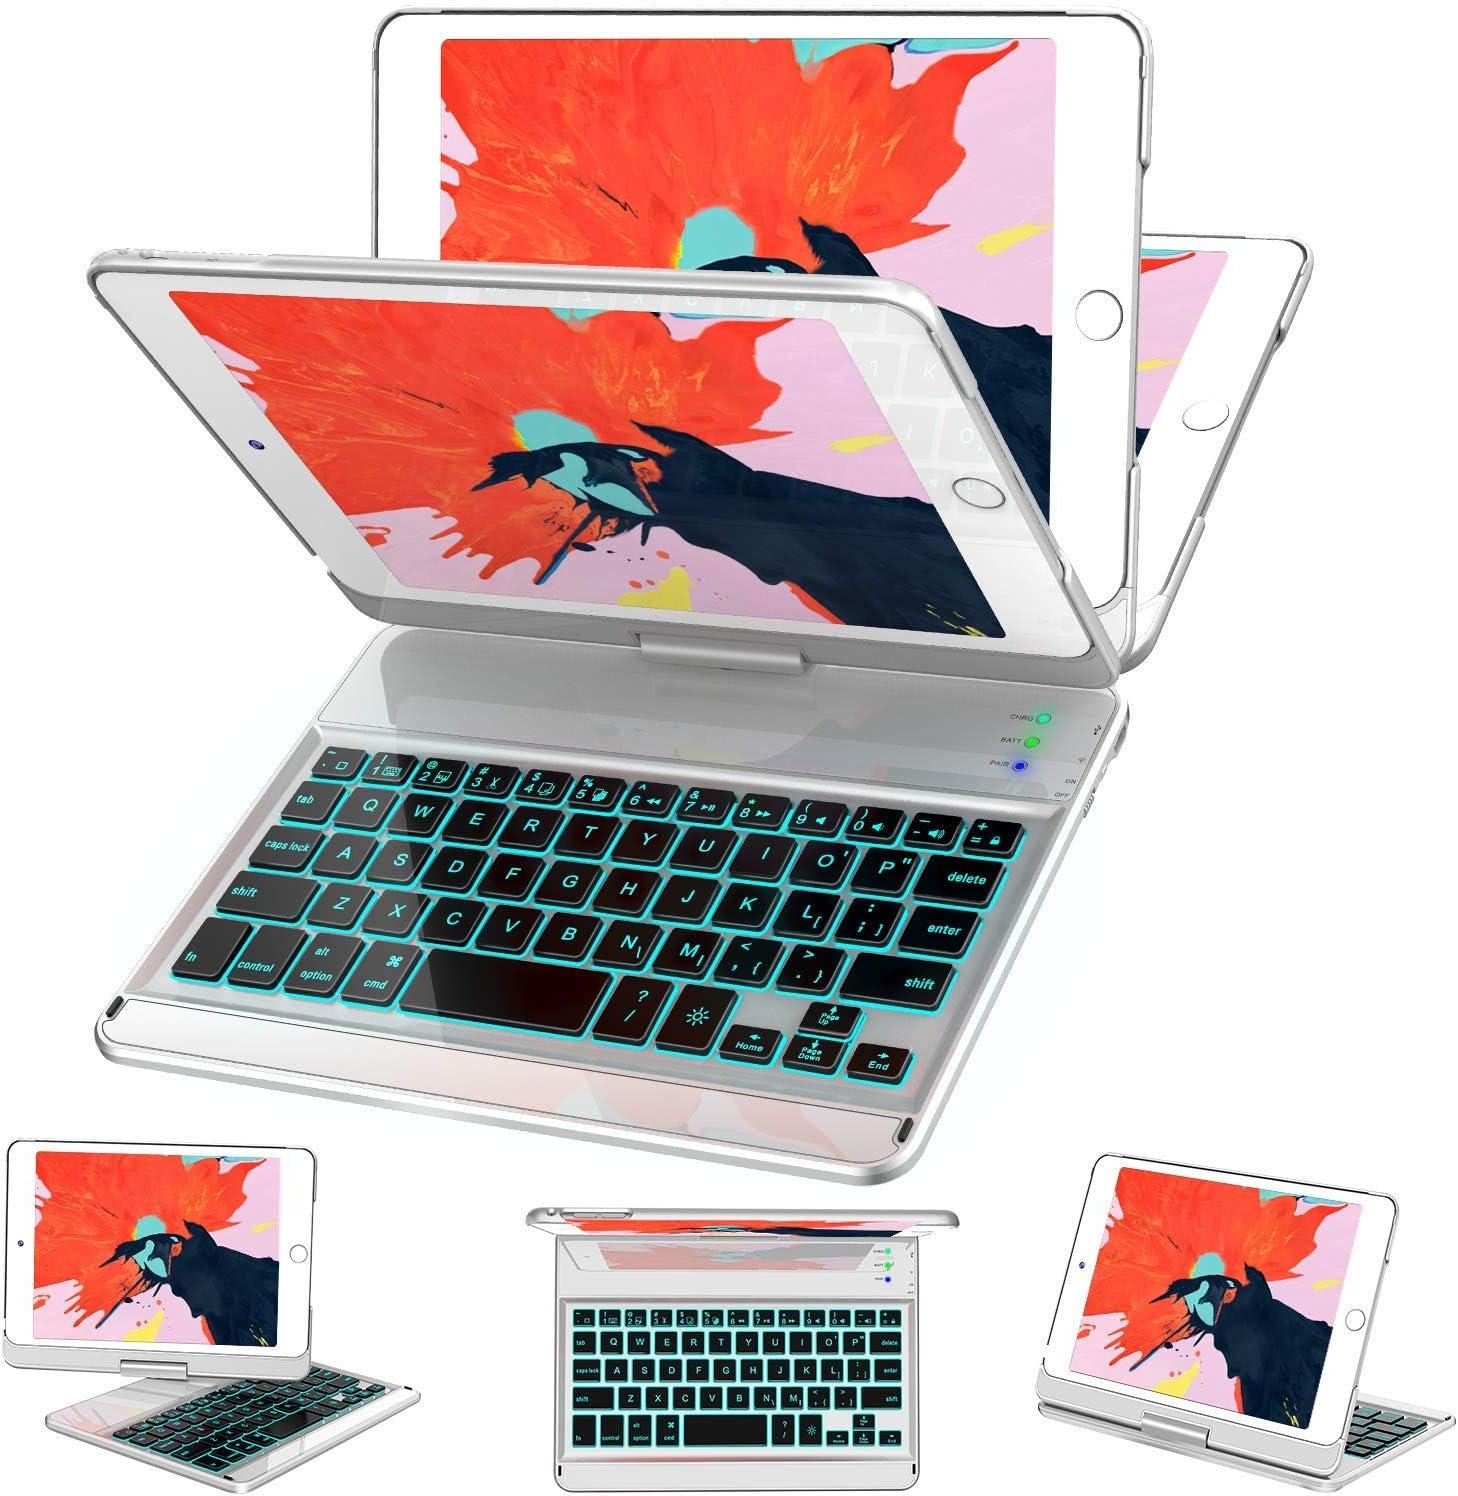 iPad Mini 5/ Mini 4 Keyboard Case - 7 Colors Backlit 360 Rotate 180 Flip Wireless Smart Folio Auto Sleep/Wake Hard Cover fit iPad Mini 5 2019(5th Gen)/ iPad Mini 4 2015